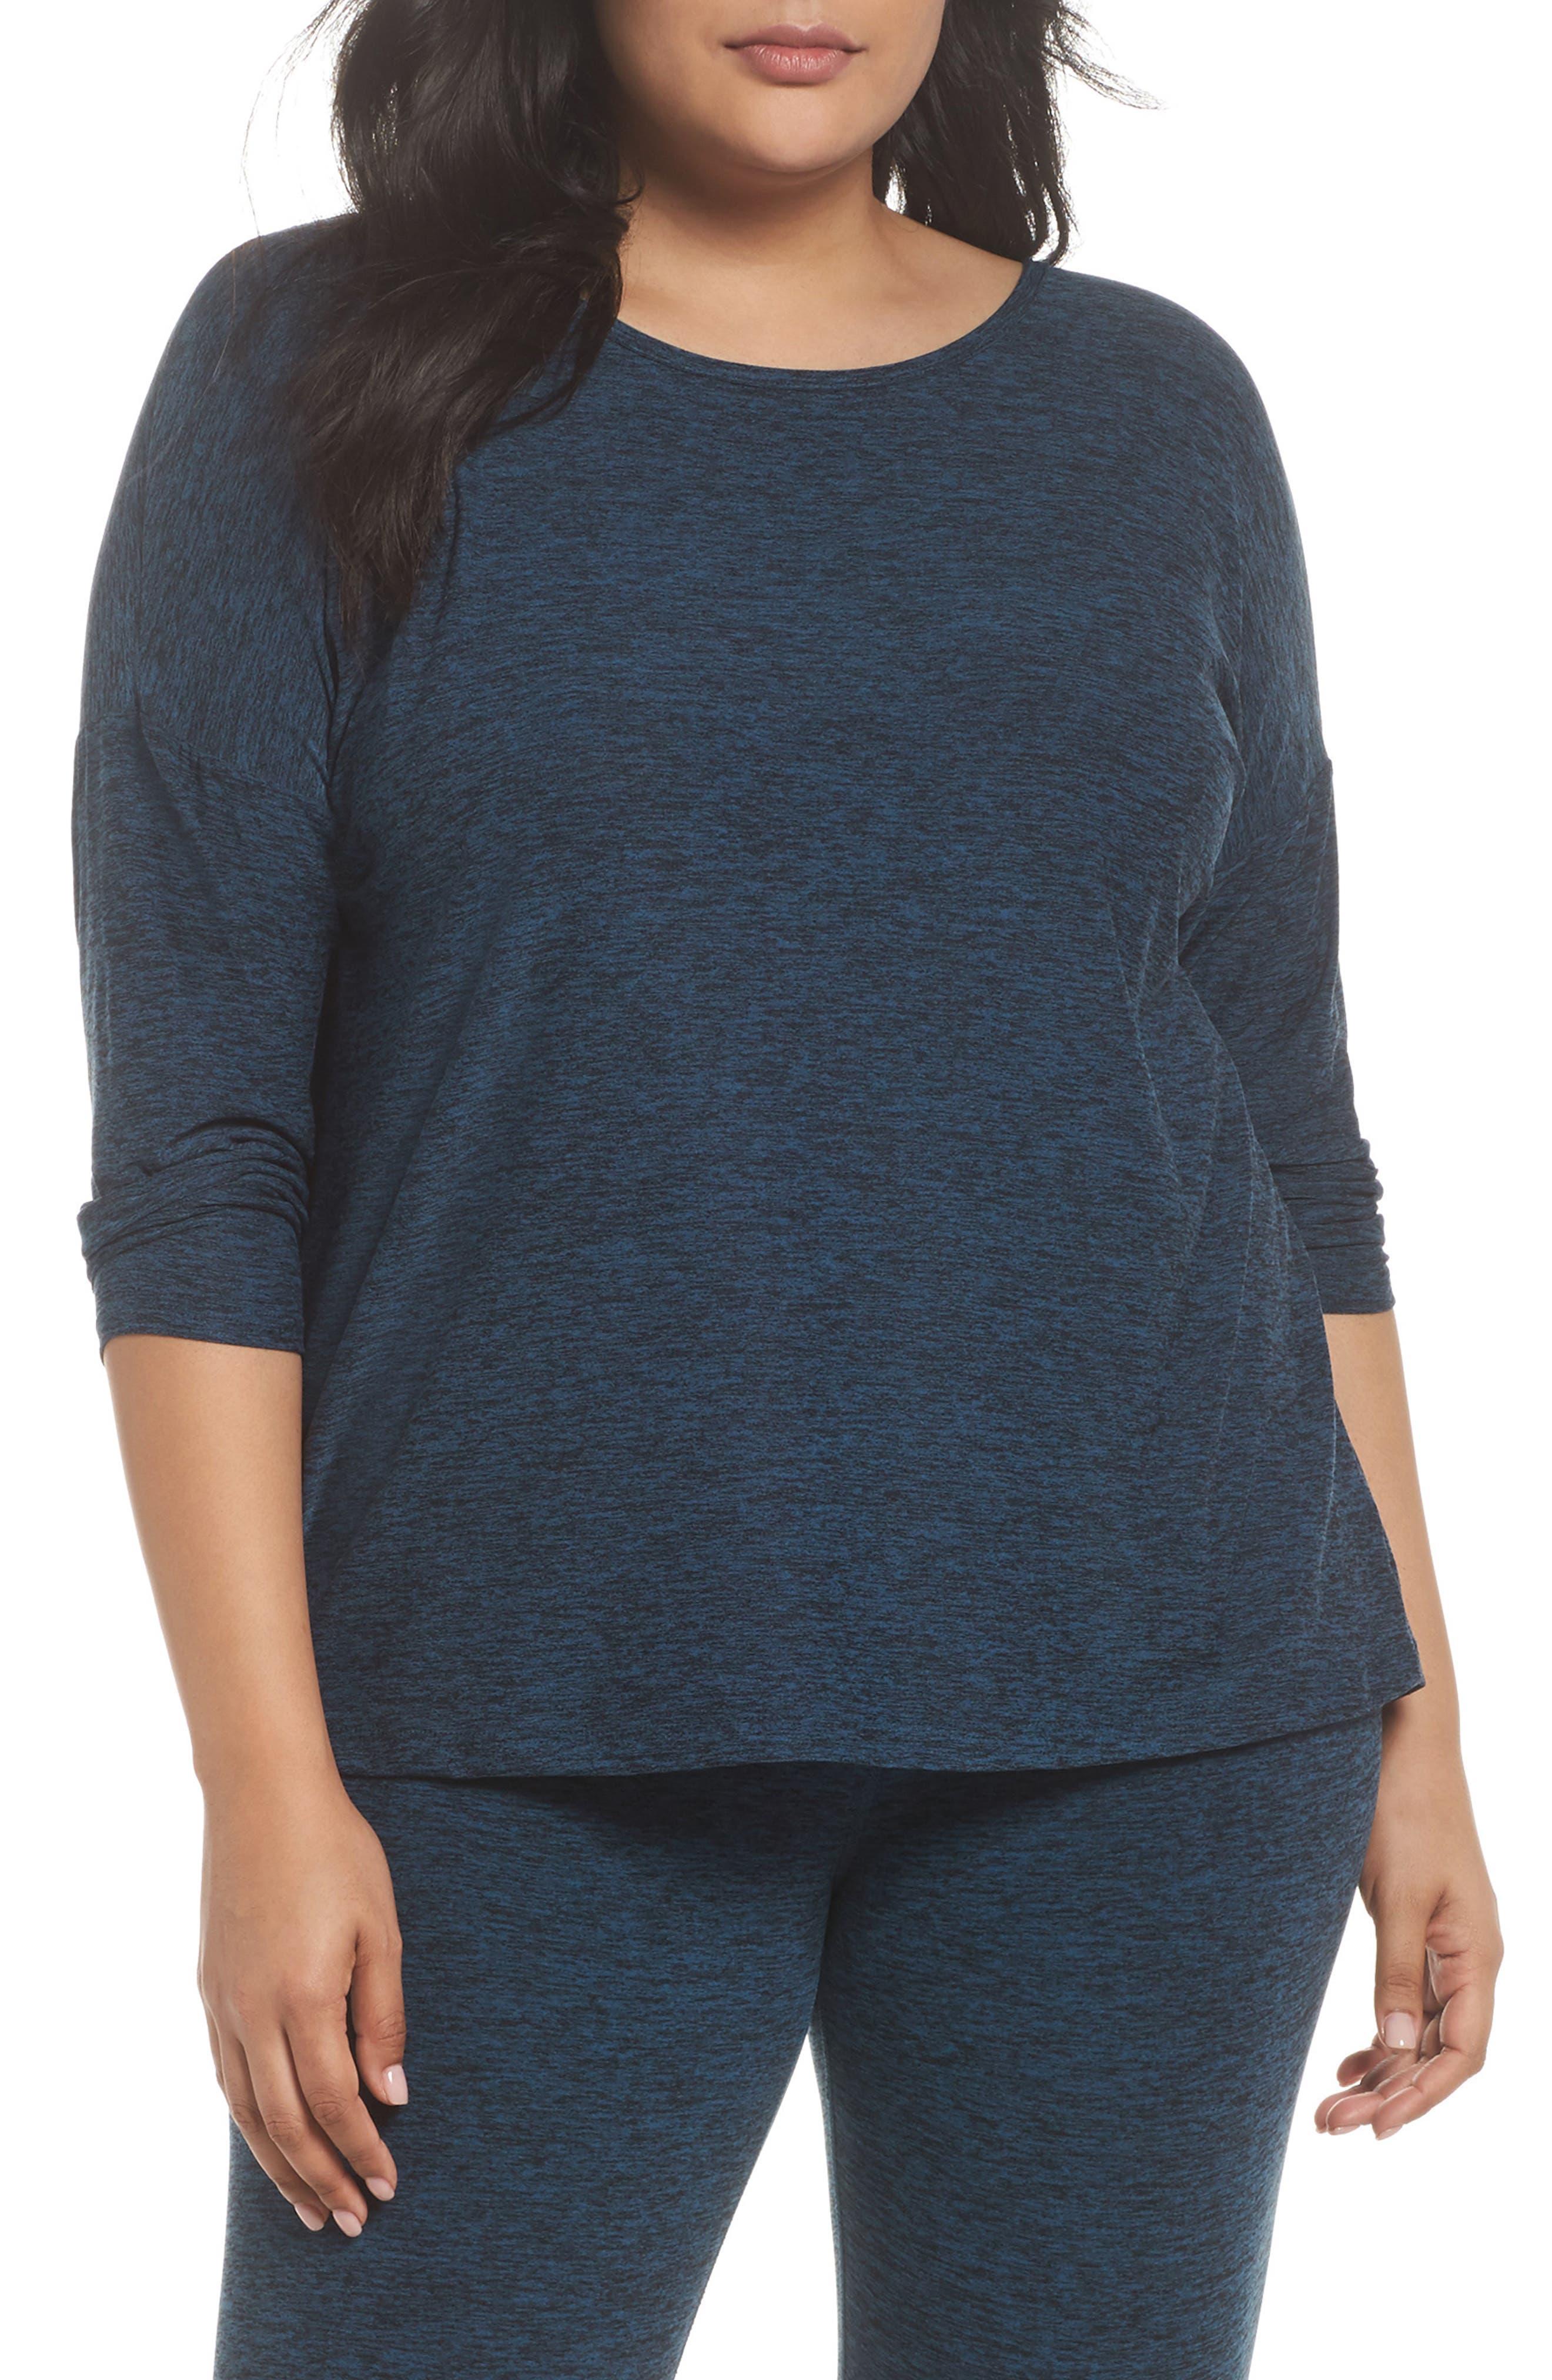 Weekend Traveler Pullover,                         Main,                         color, Black- Deep Sapphire